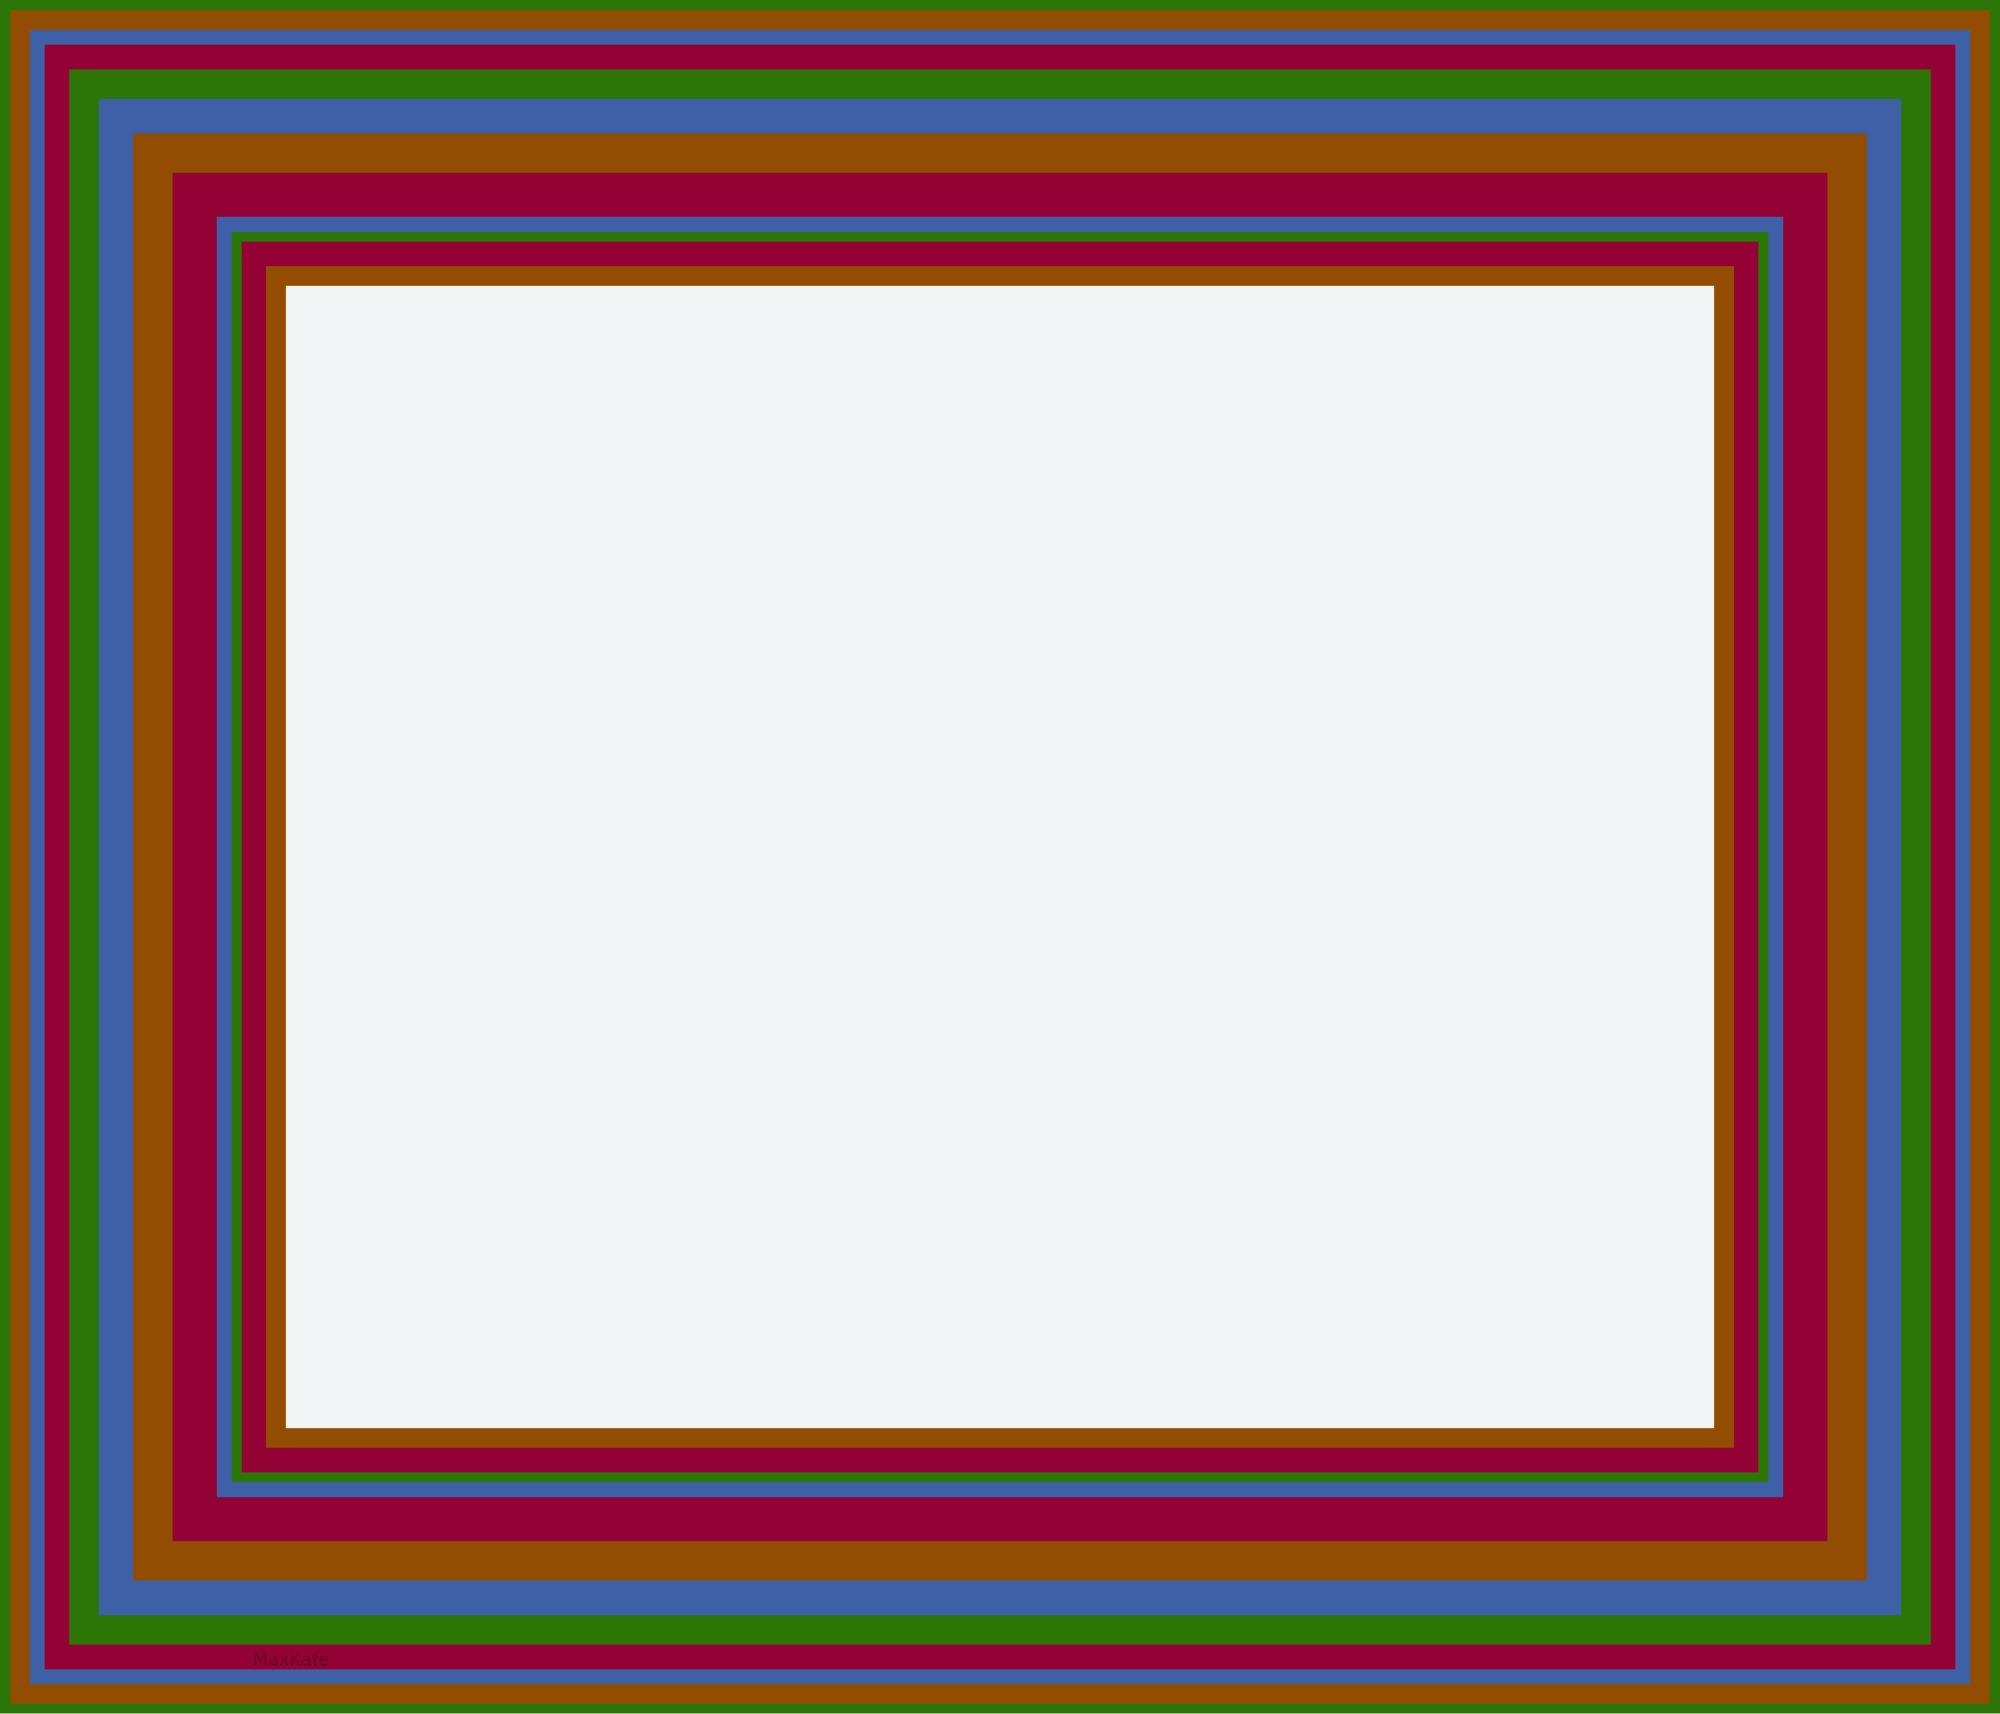 "MK16LFS121 Frame 6x7 Wine Green Blue Brown <a href=""https://dl.orangedox.com/mVwbog"">[DOWNLOAD]</a>"